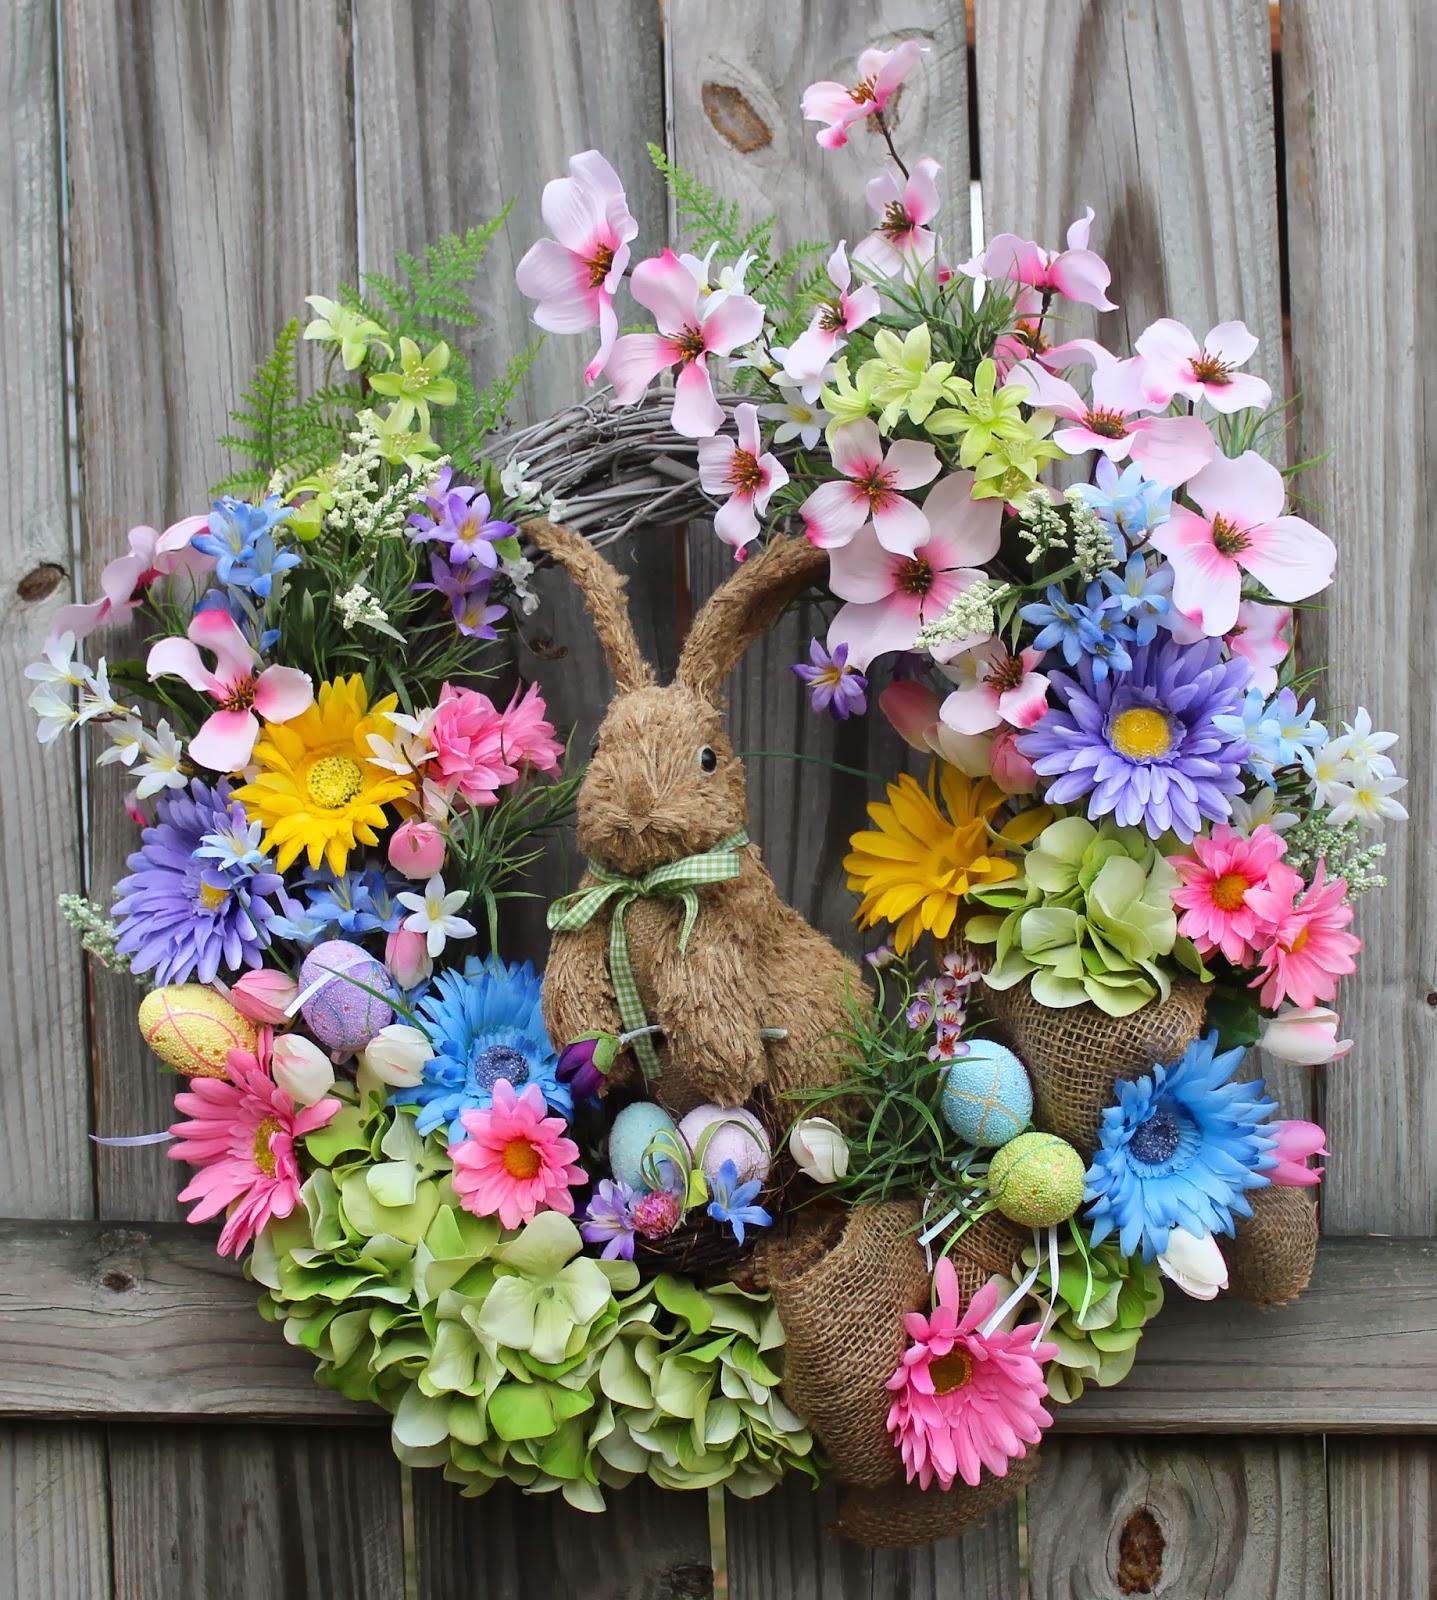 Burlap Easter Bunny & Eggs Colorful Daisy Dogwood Spring Wreath, pink, blue, purple, 12″ Burlap Bunny Rabbit